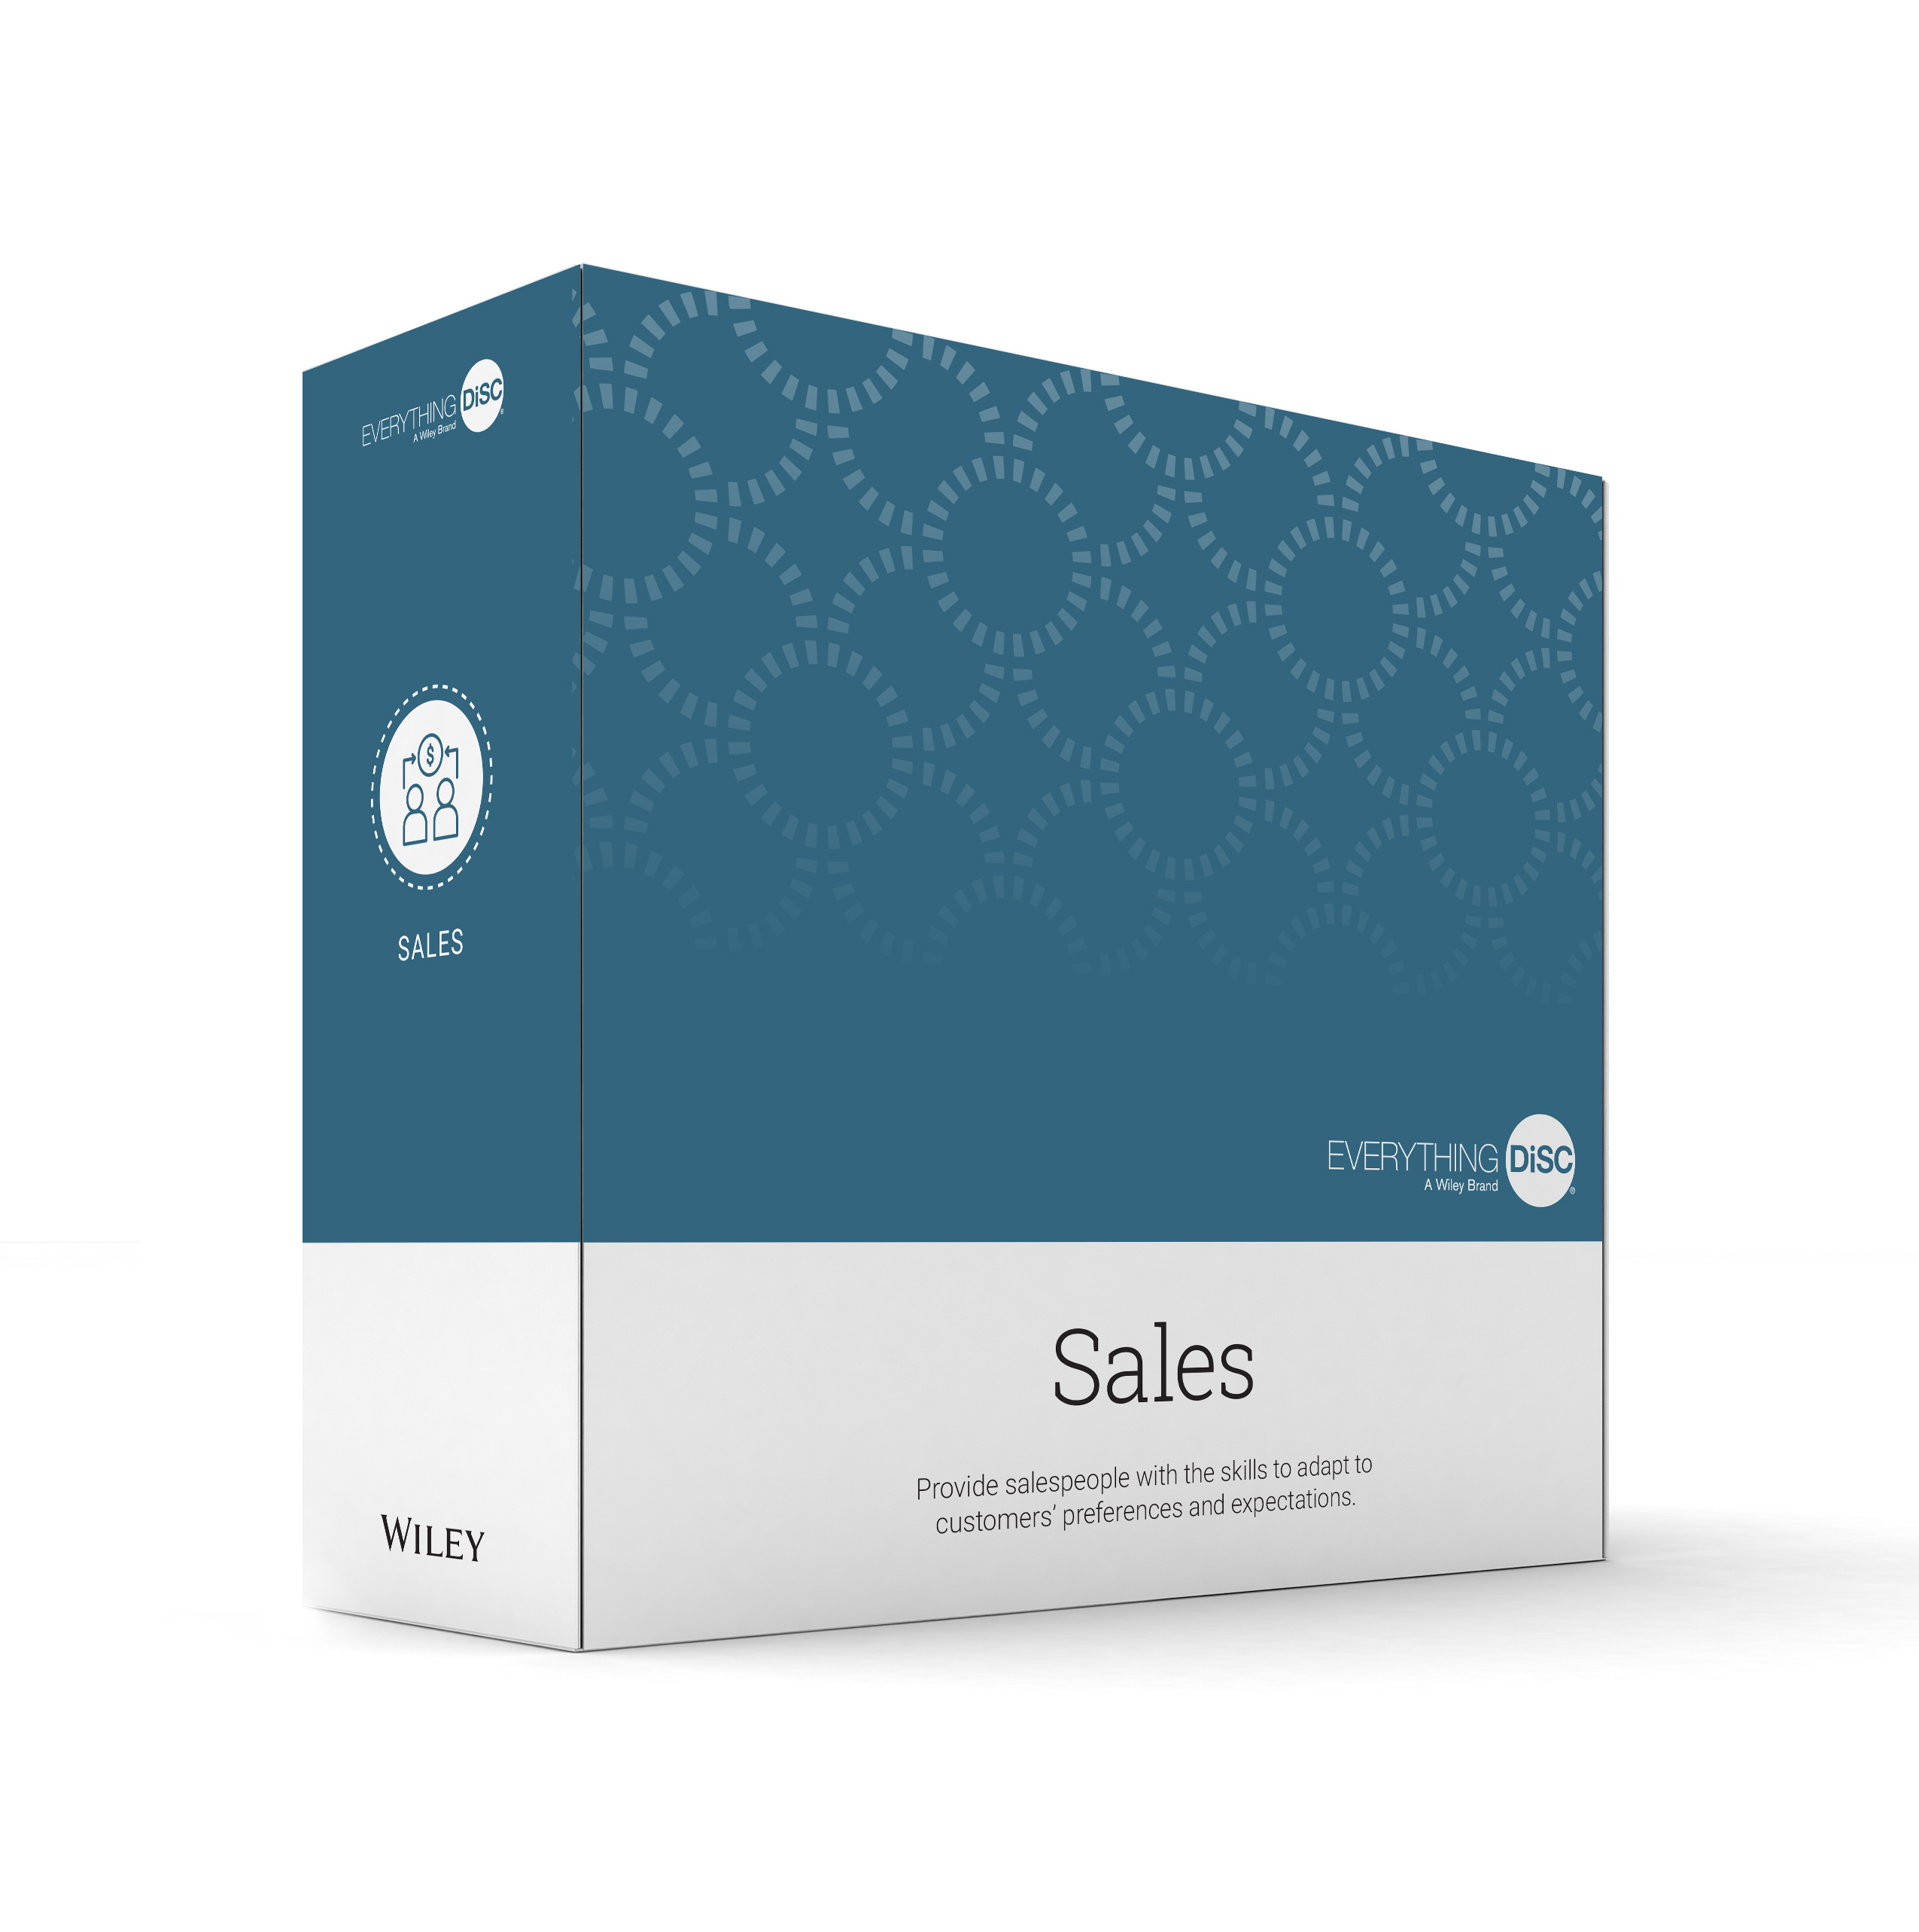 everything-disc-sales-facilitator-kit-box.jpg